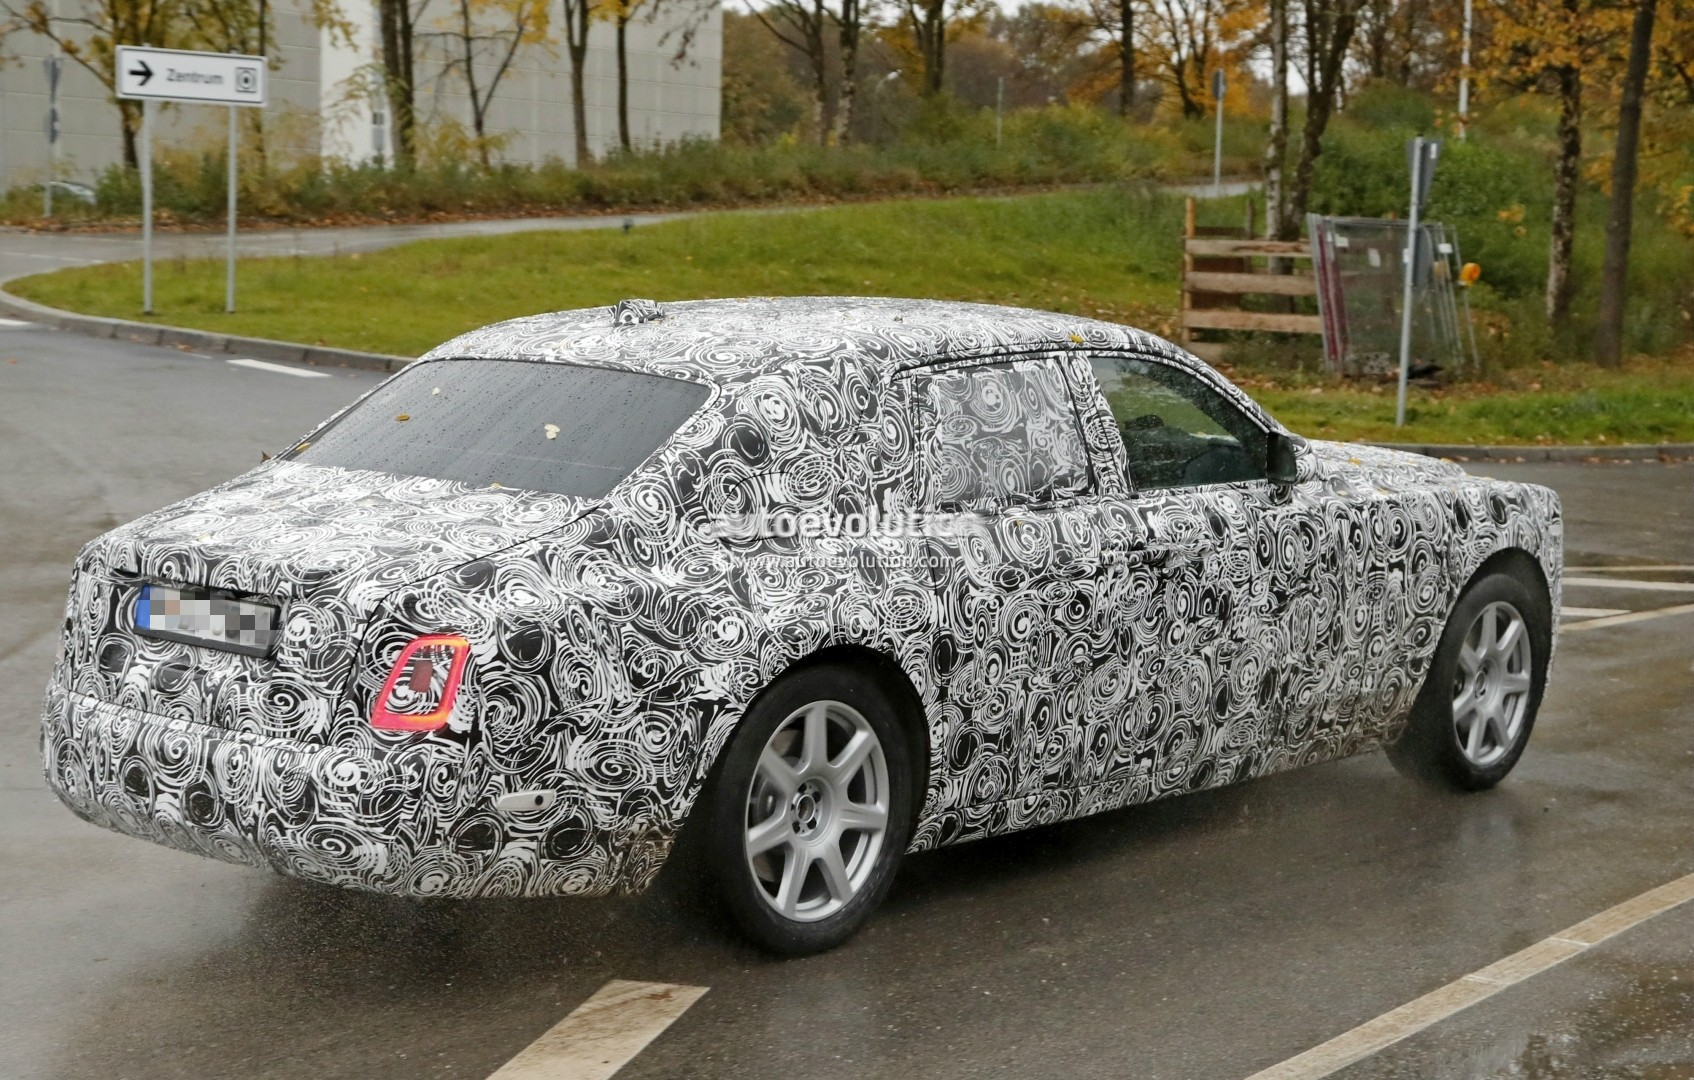 2017 - [Rolls Royce] Phantom - Page 2 2018-rolls-royce-phantom-prototype-partially-reveals-new-headlights-taillights_8